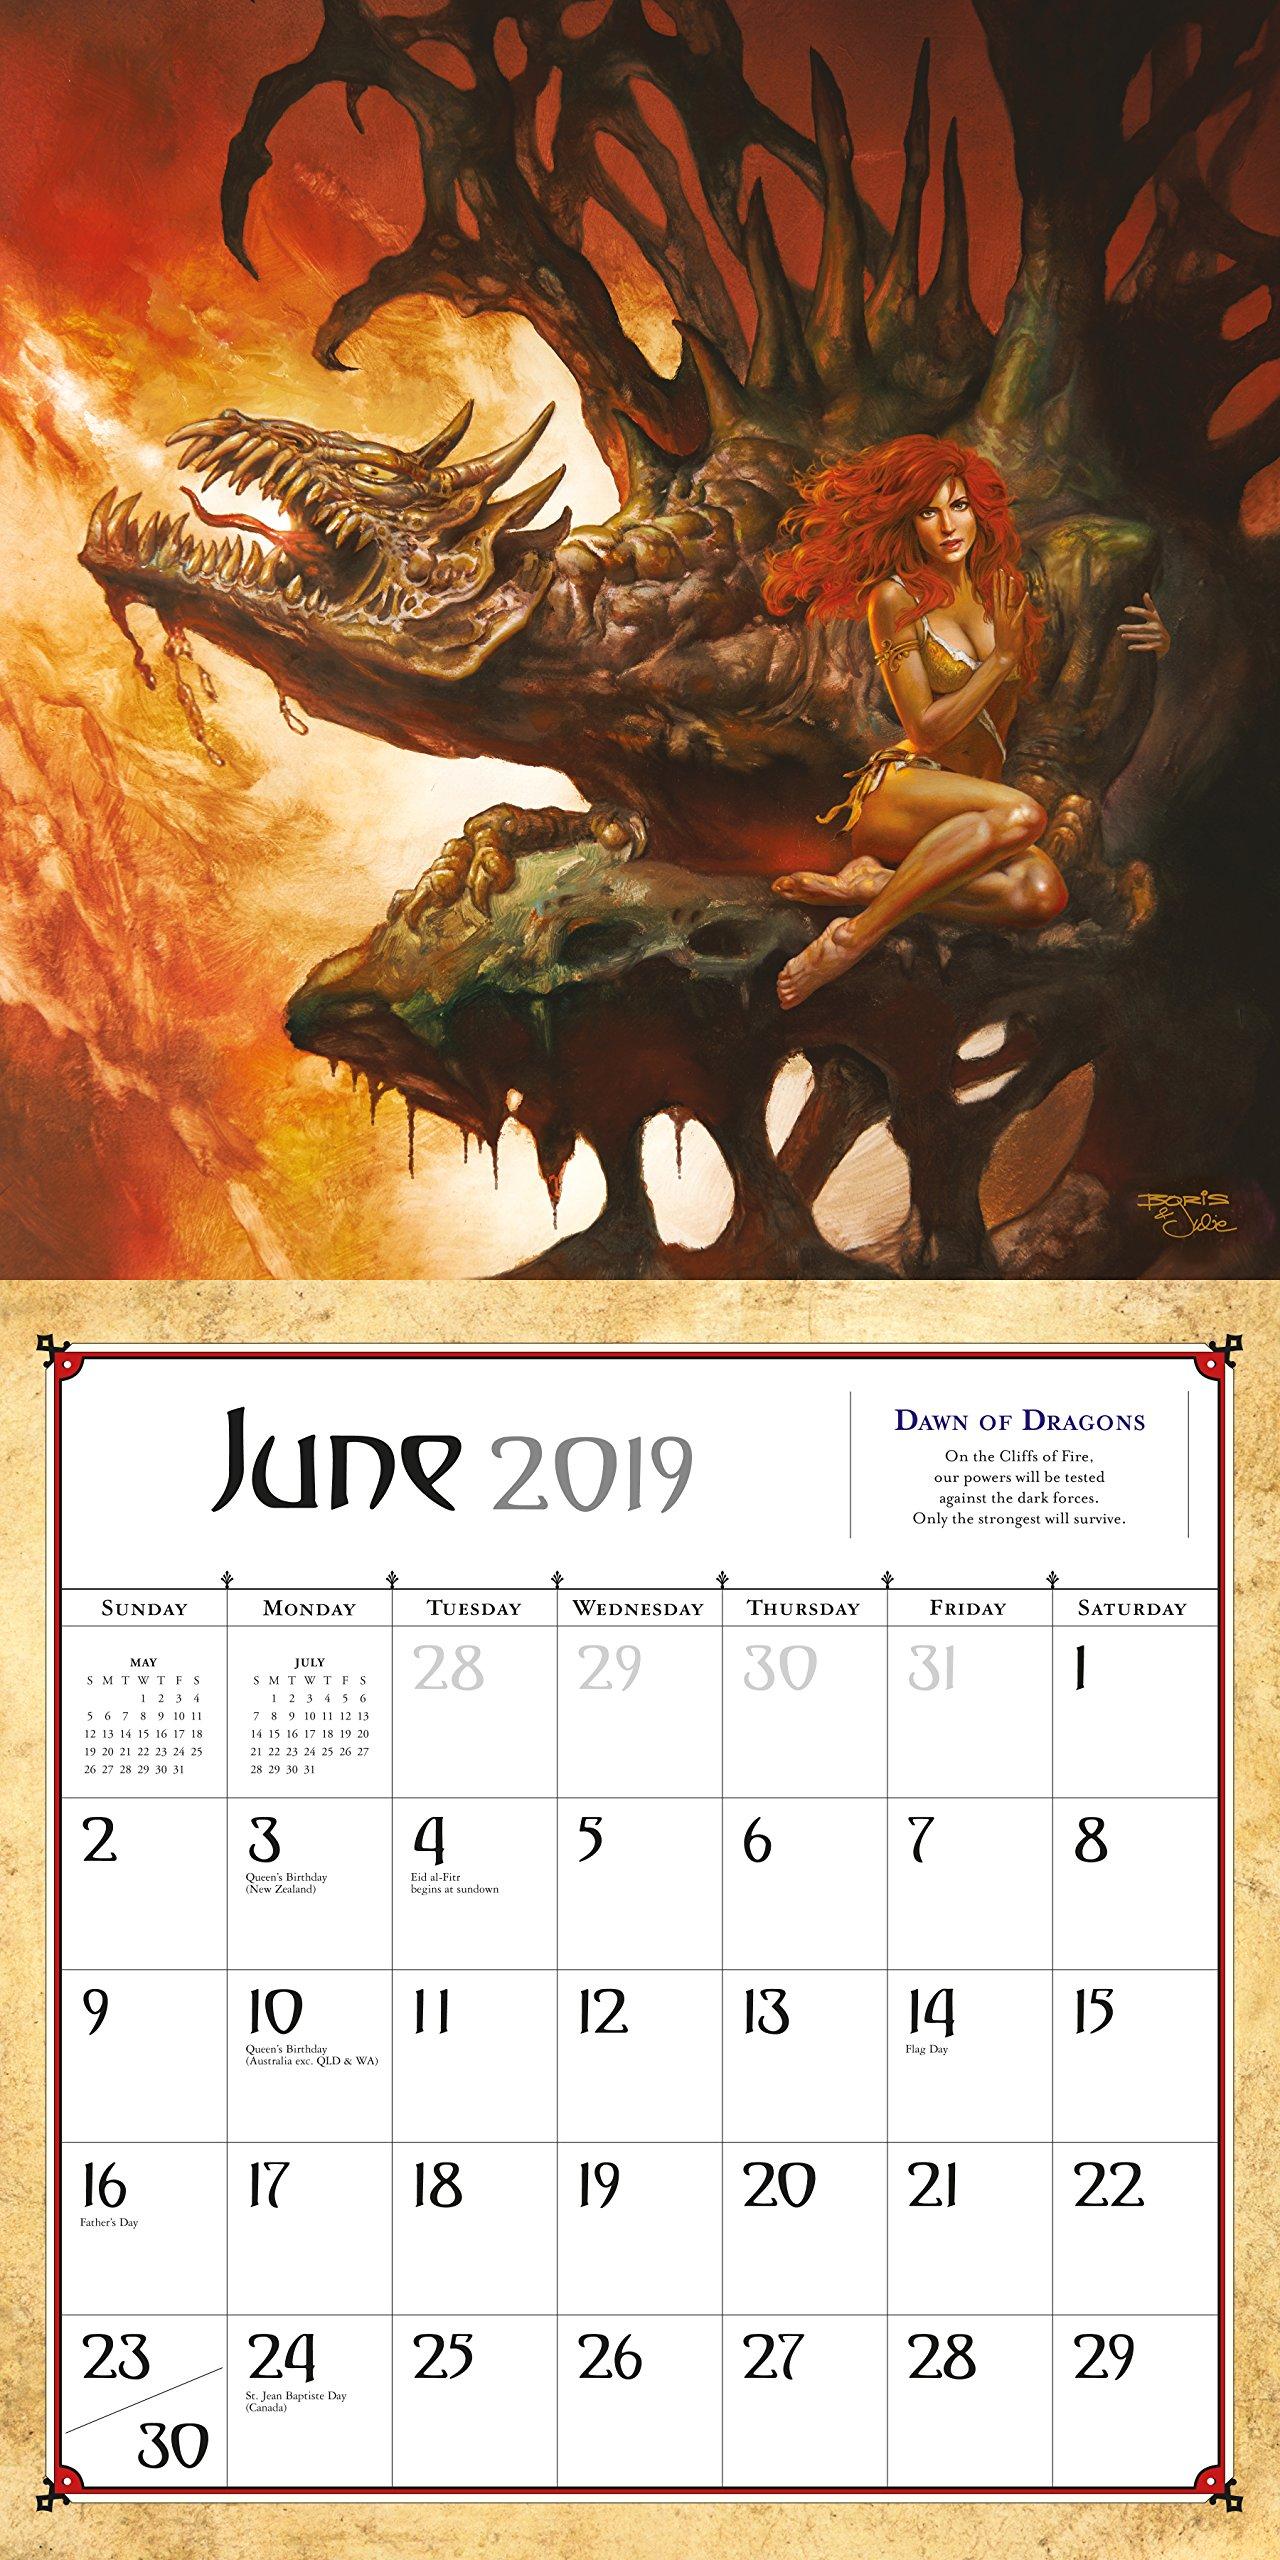 Boris Vallejo & Julie Bell's Fantasy Wall Calendar 2019 by Workman Publishing (Image #5)